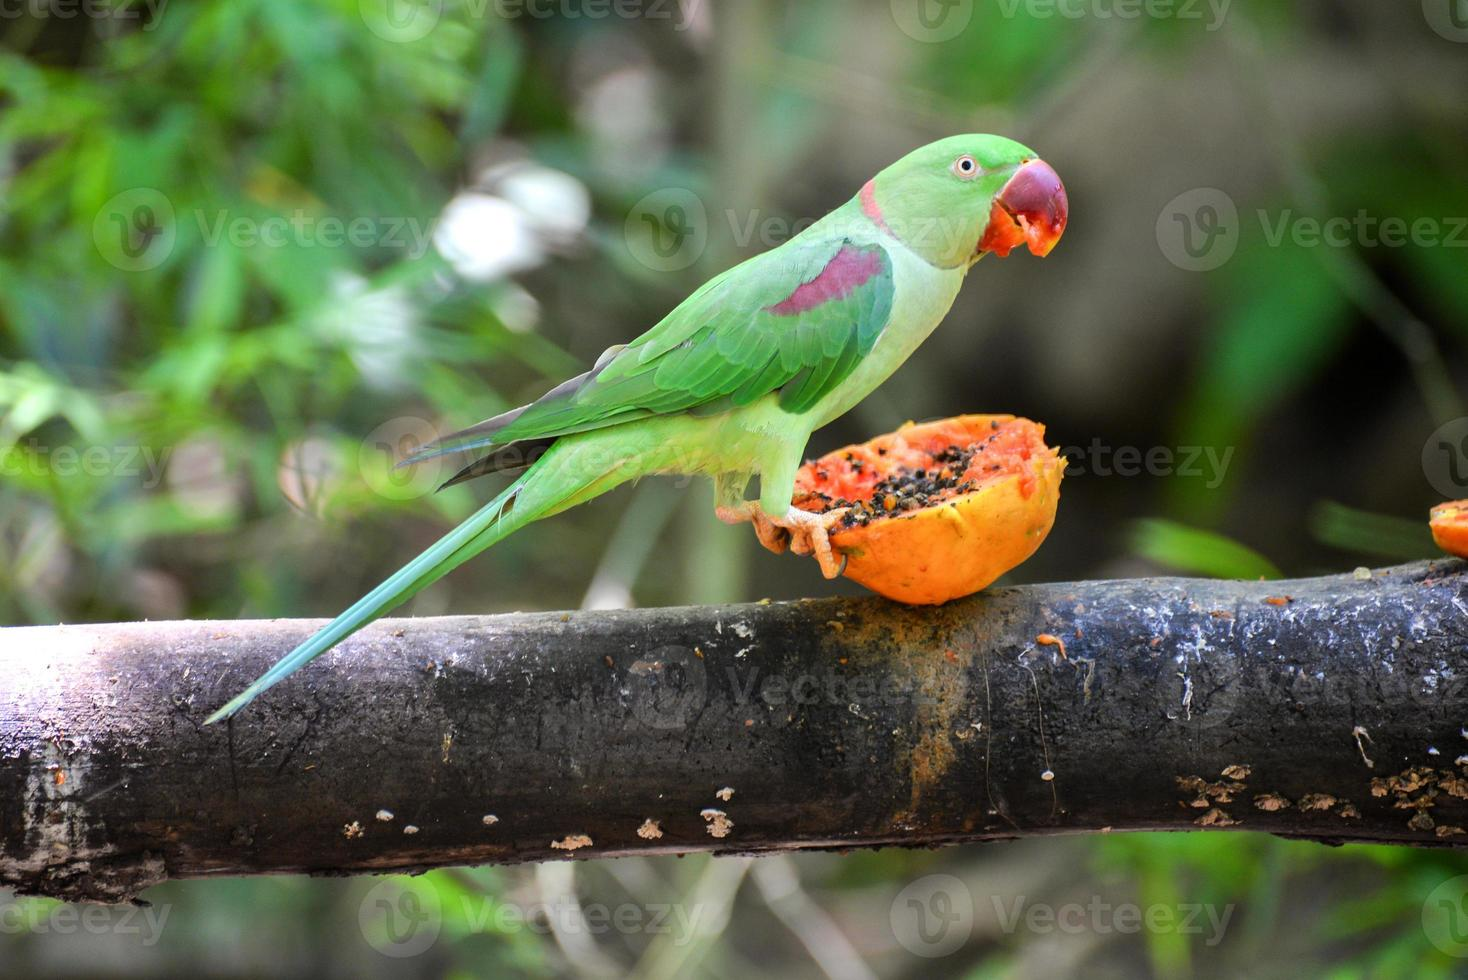 hermoso pájaro verde loro eclectus foto